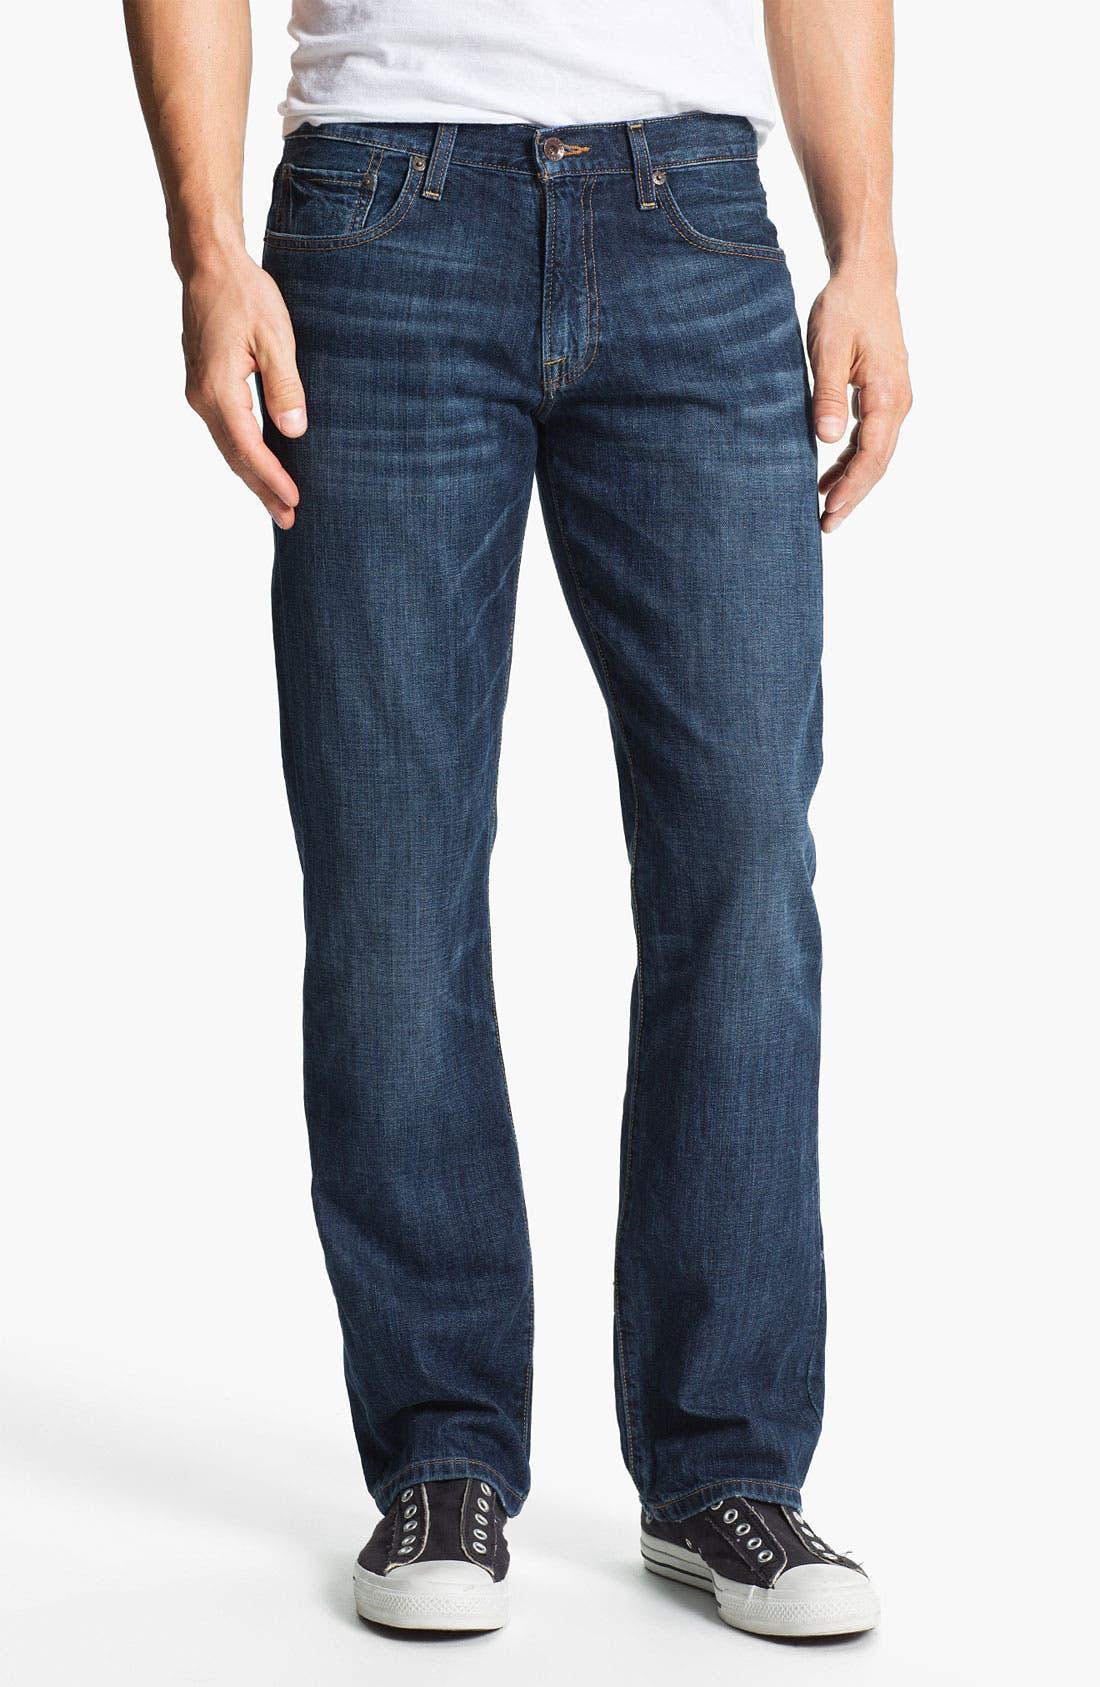 Alternate Image 1 Selected - Lucky Brand '221 Original' Straight Leg Jeans (Medium Temescal)